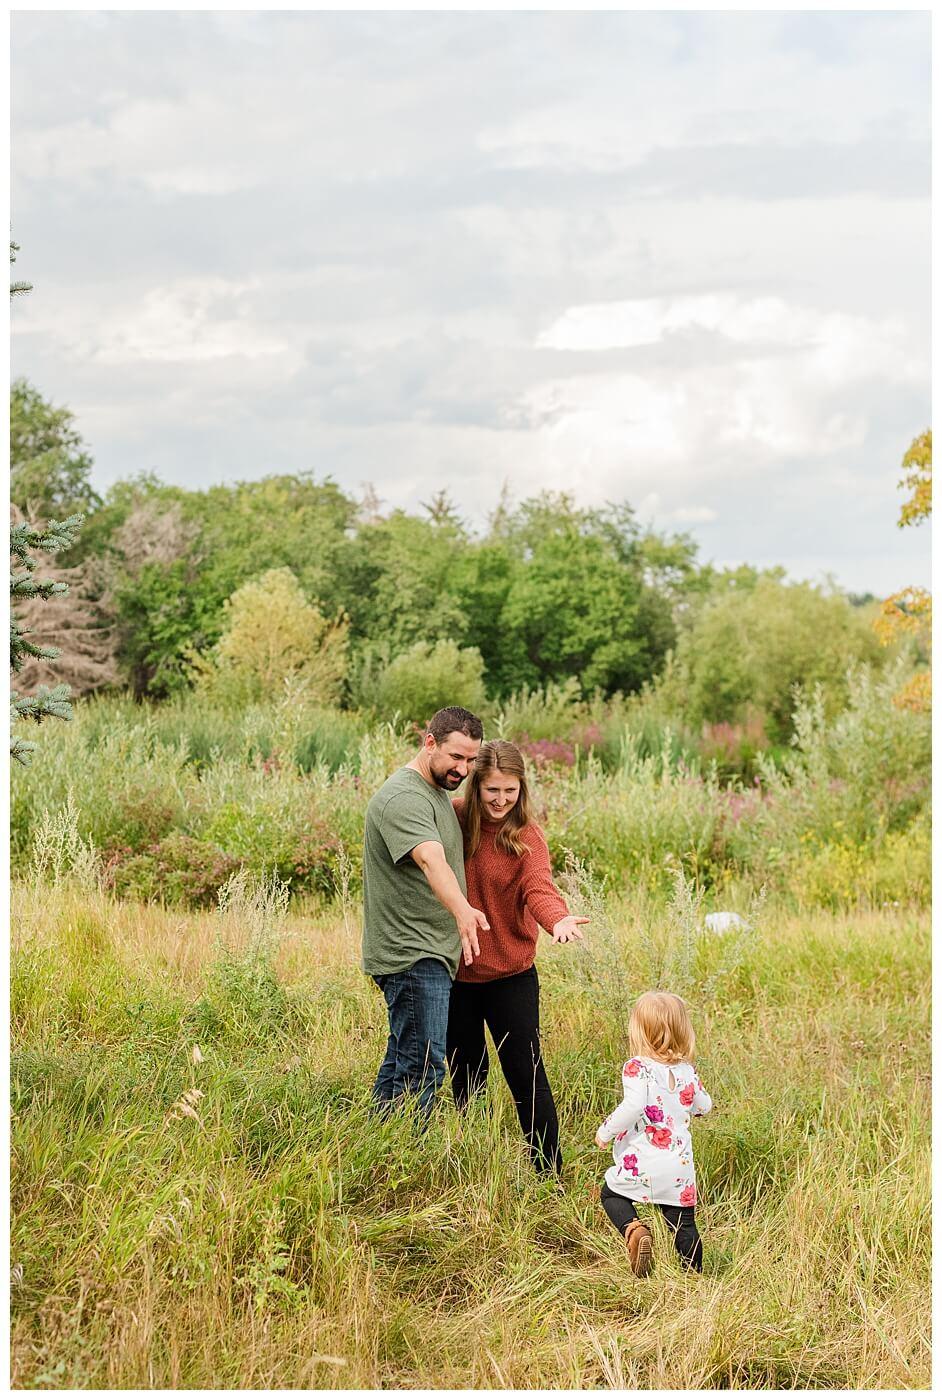 Eyre Family 2021 - AE Wilson Park - Family Photo Shoot - 16 - Little girl blazes a new trail